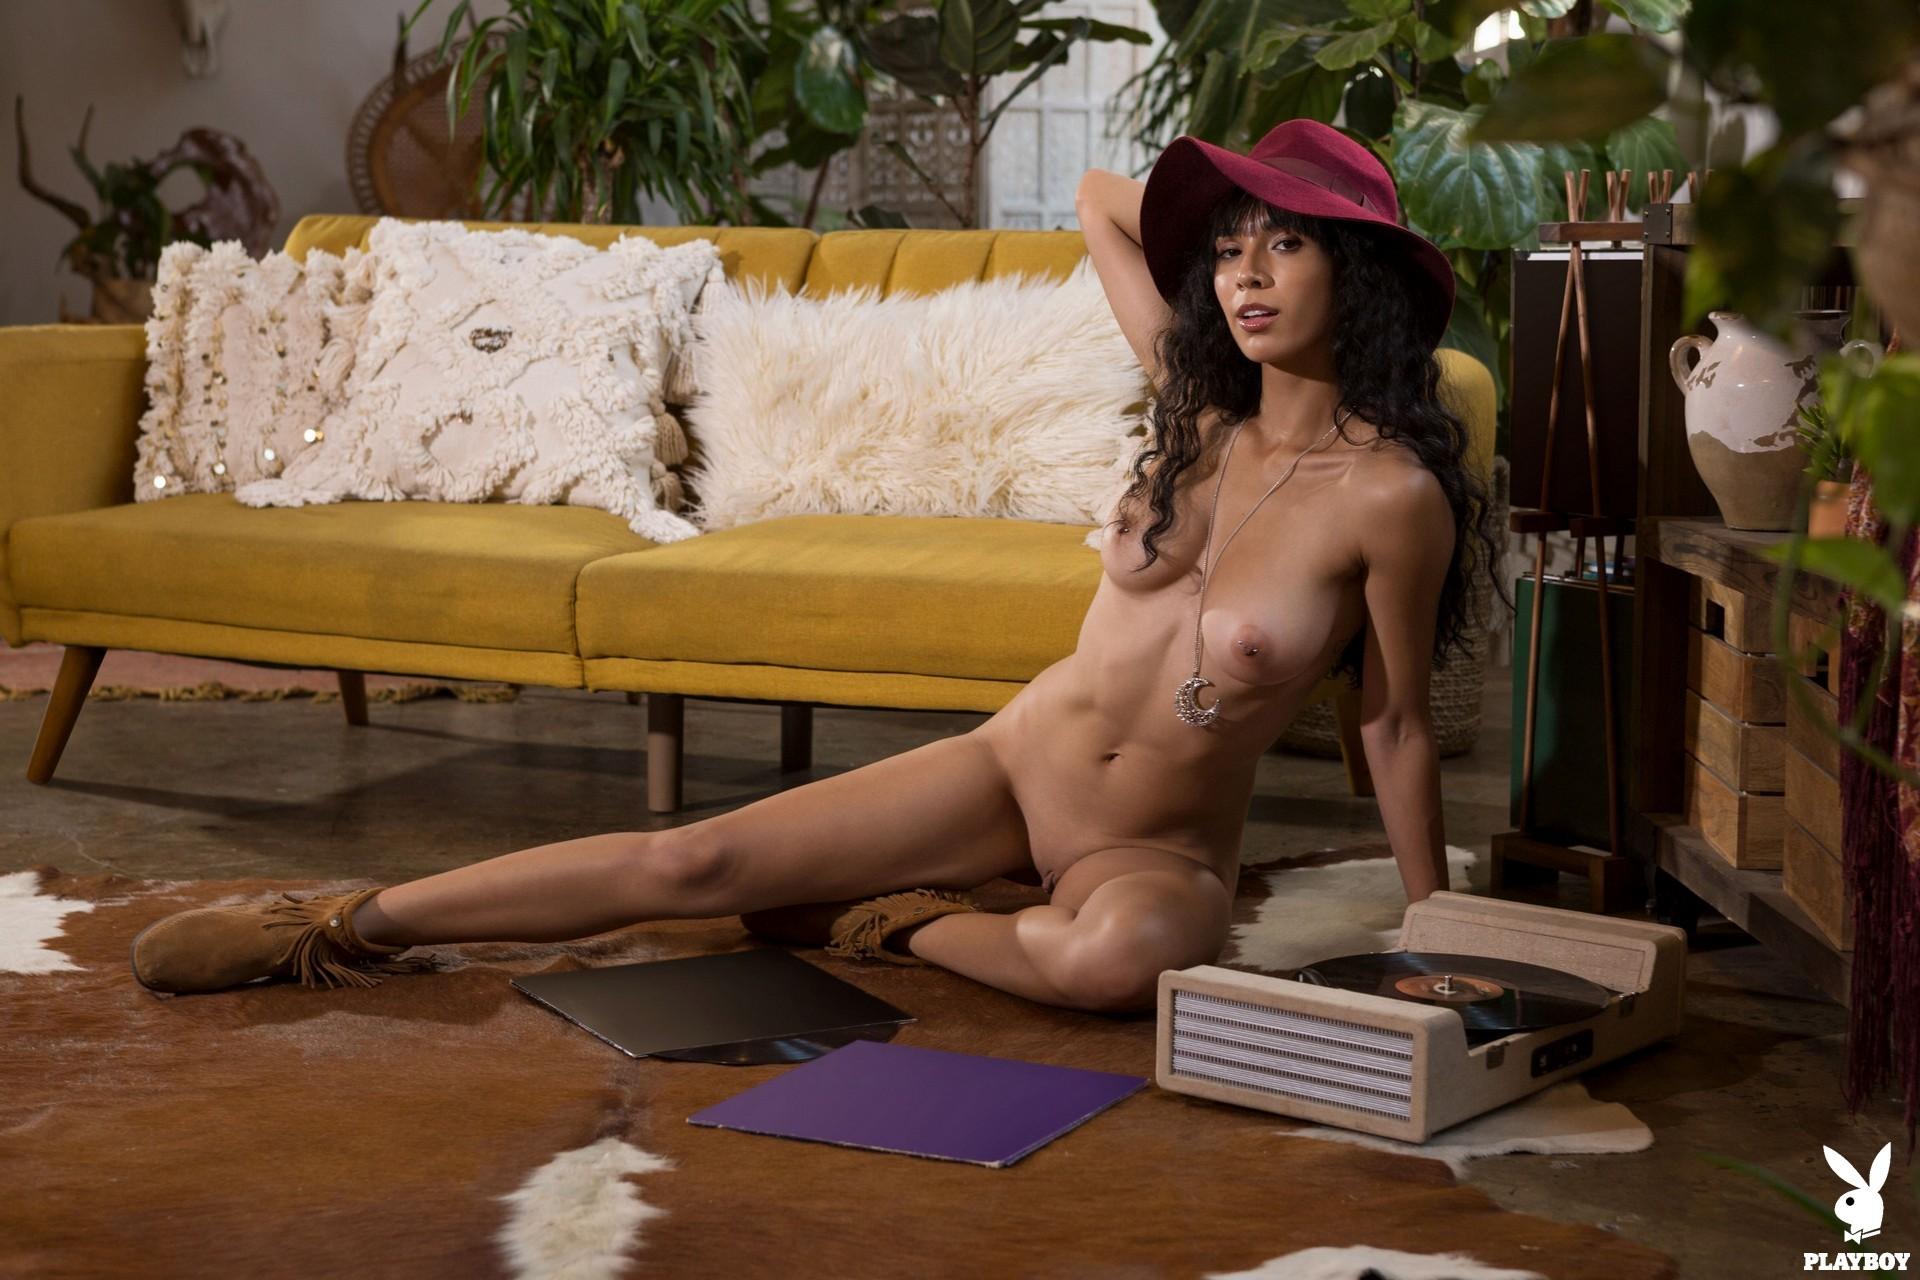 Erika De Leija in Funky and Free - Playboy Plus 15